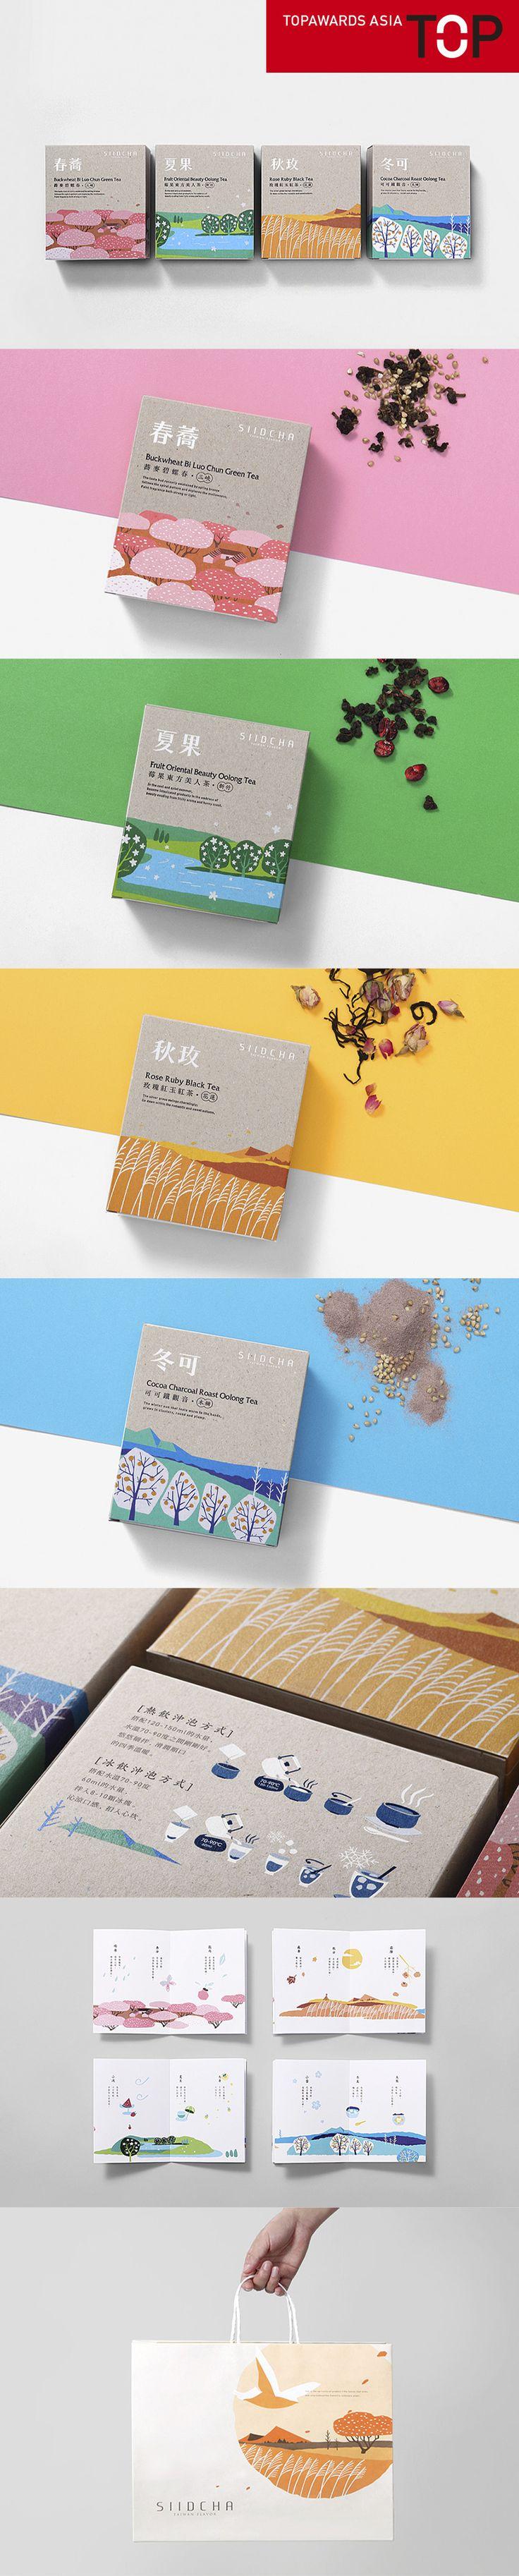 Topawards Asia - SIID CHA tea Taiwan